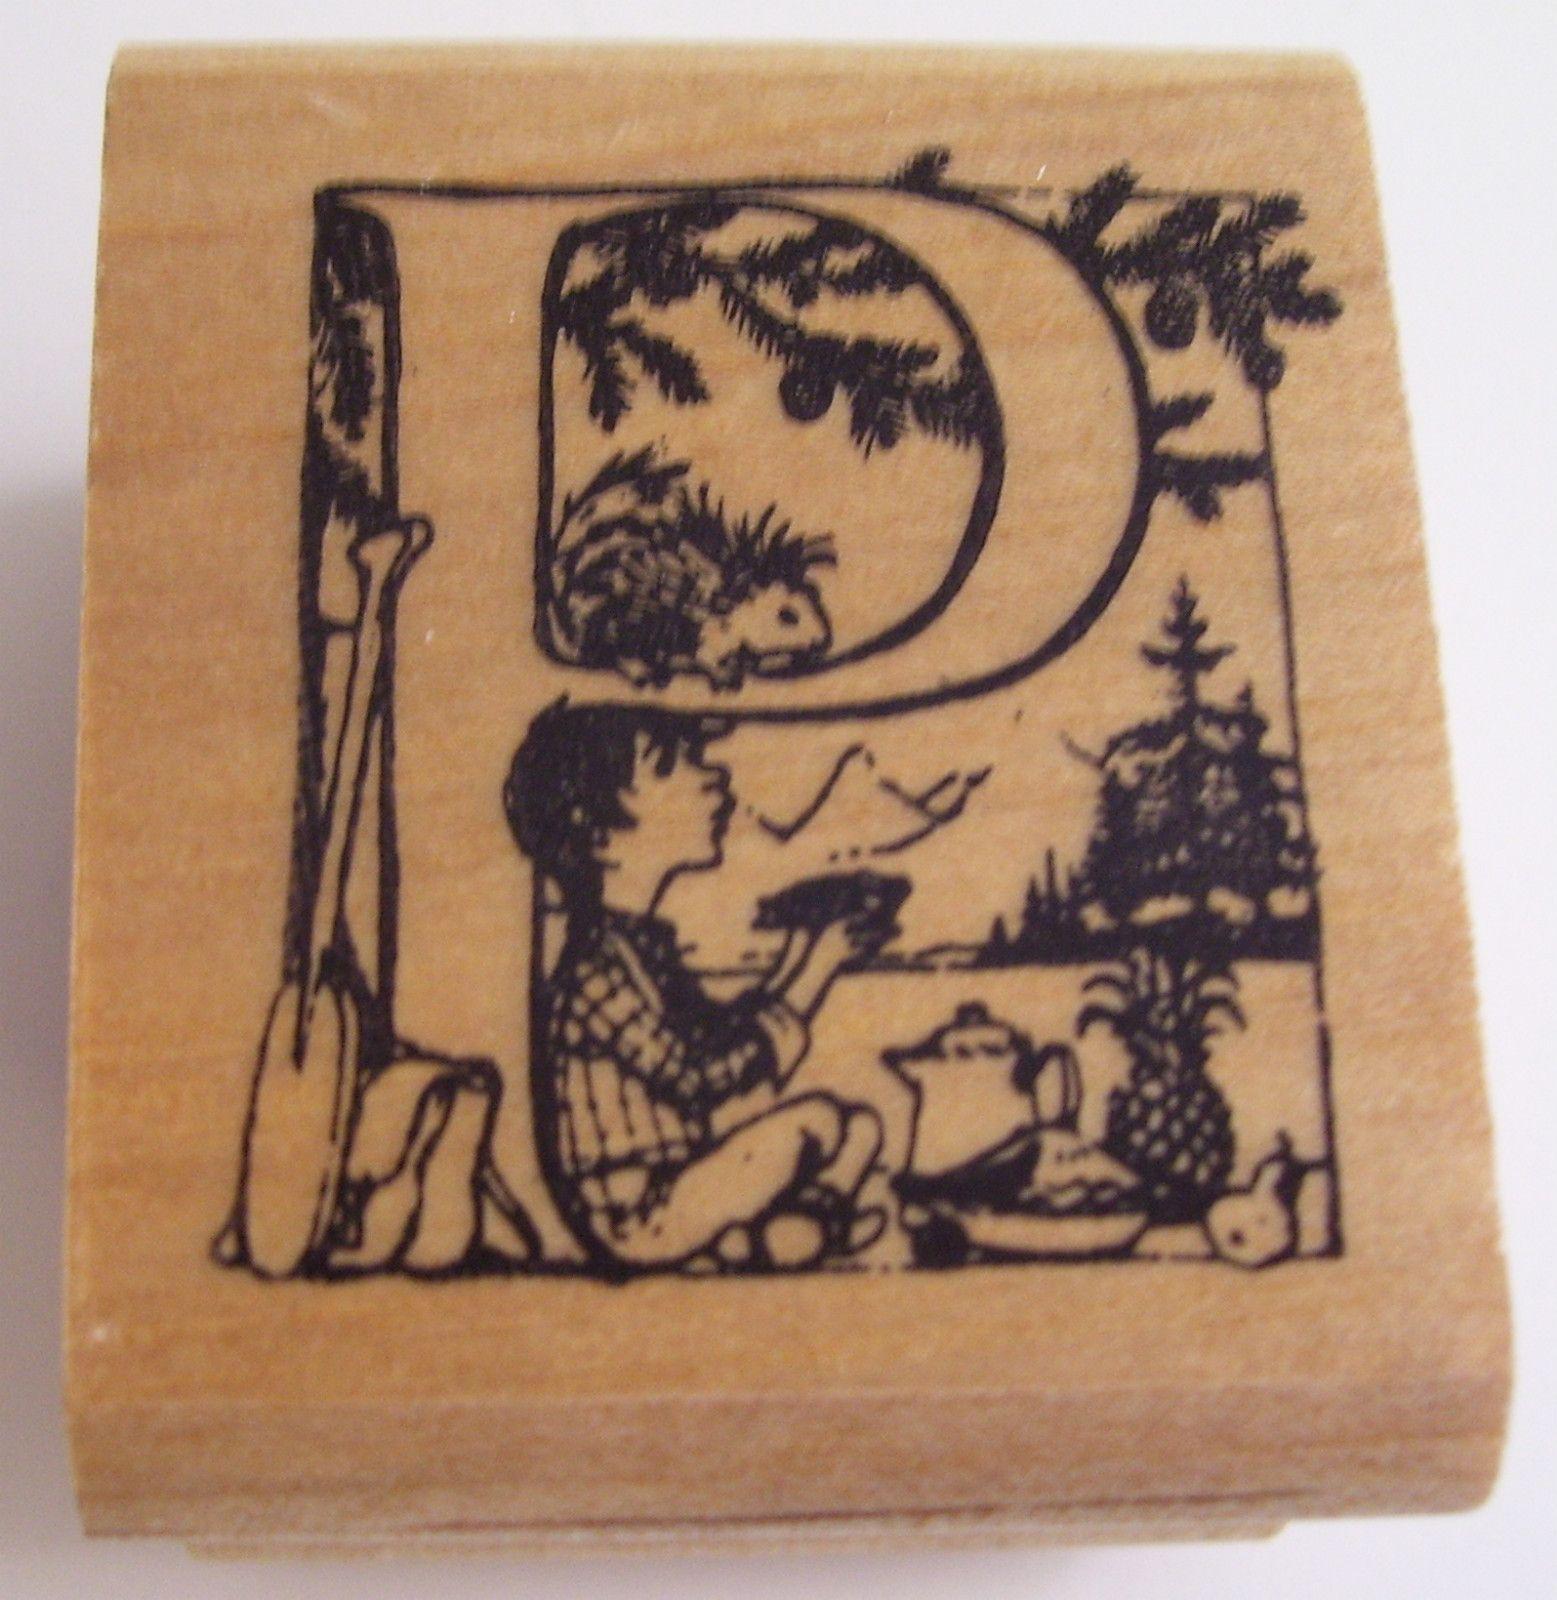 Trina Schart Hyman Alphabet Letter P Rubber Stamp